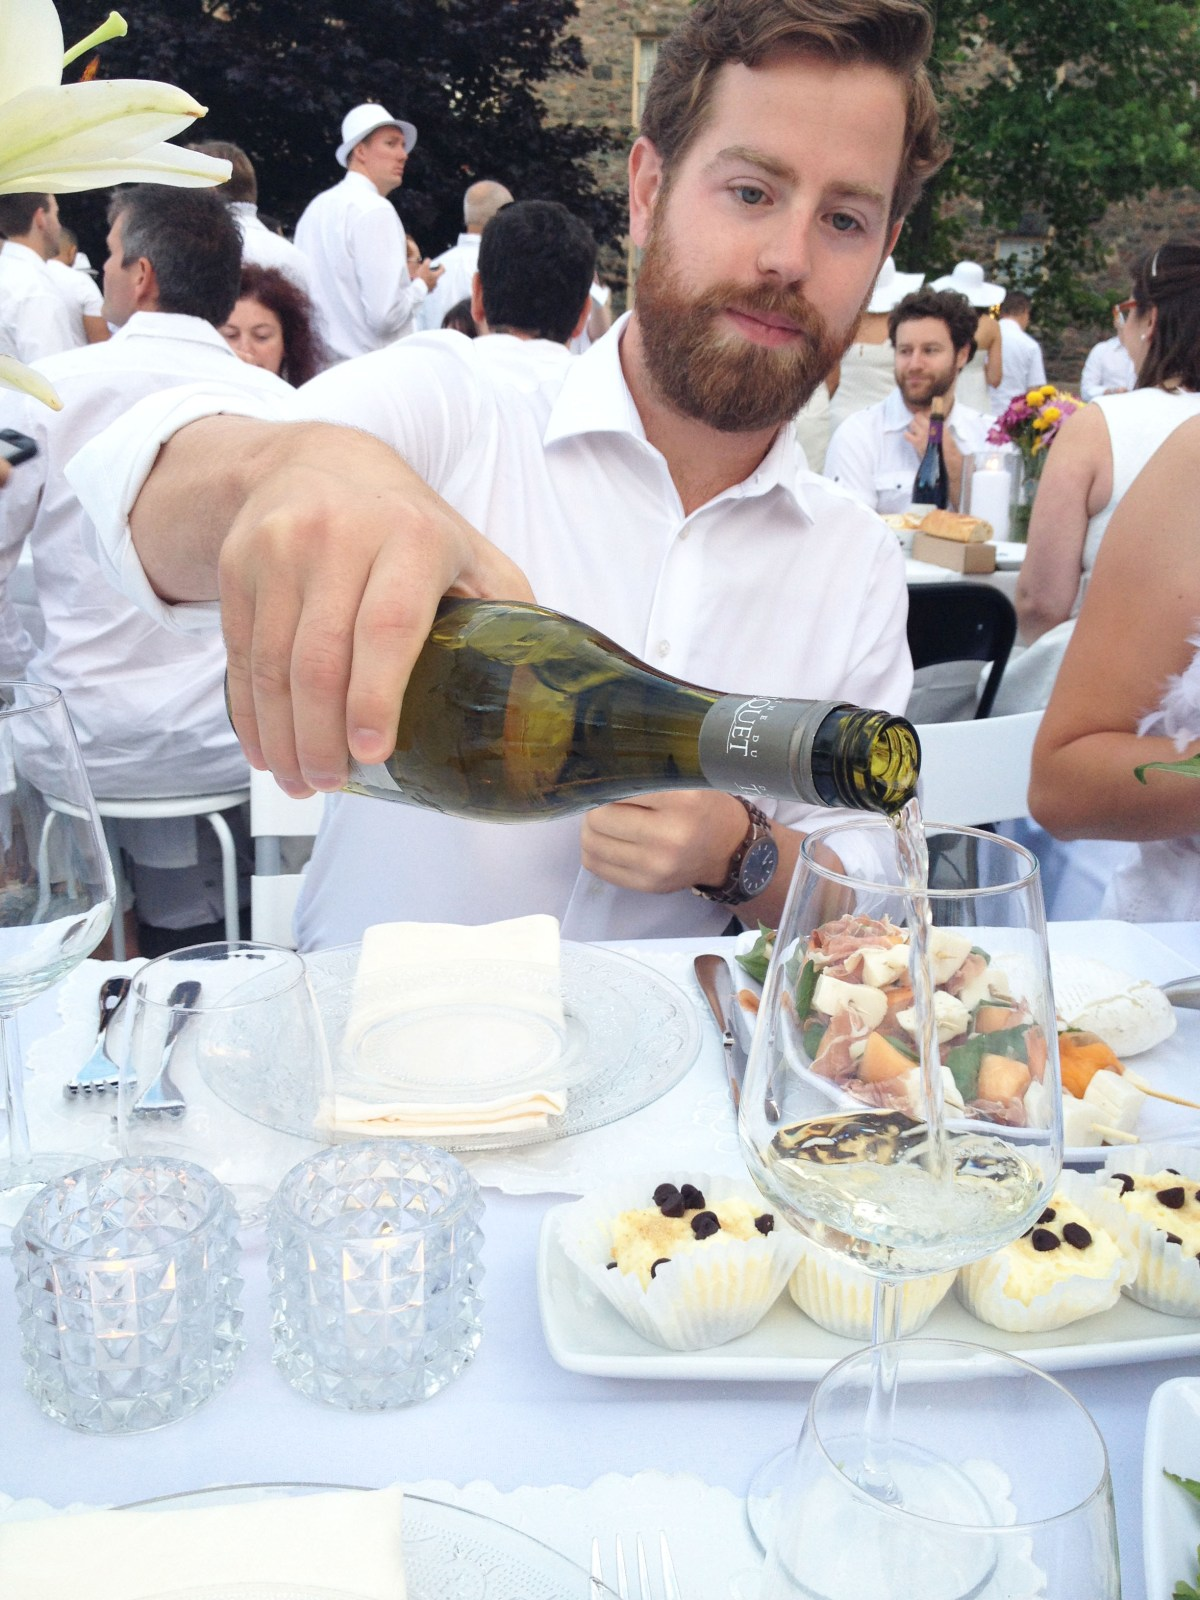 adam with wine